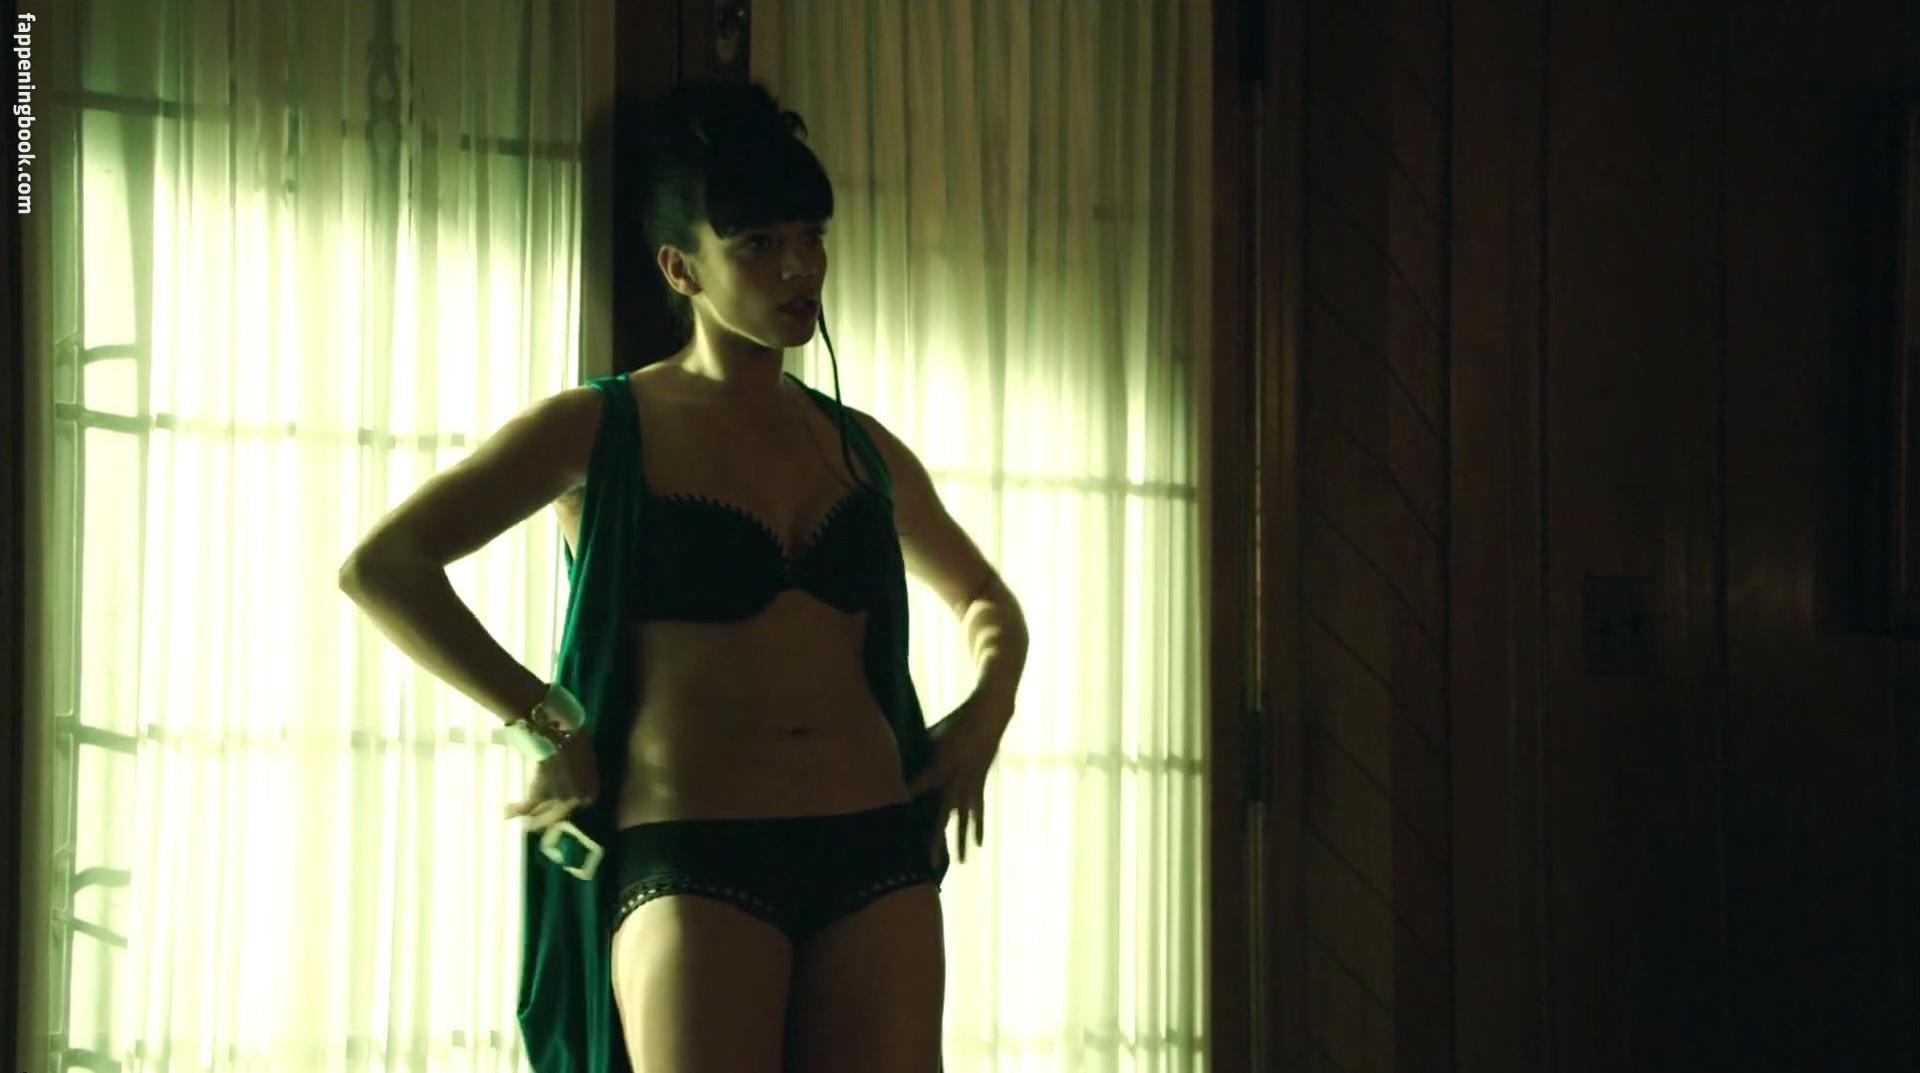 Hannah John-Kamen Nude, Sexy, The Fappening, Uncensored